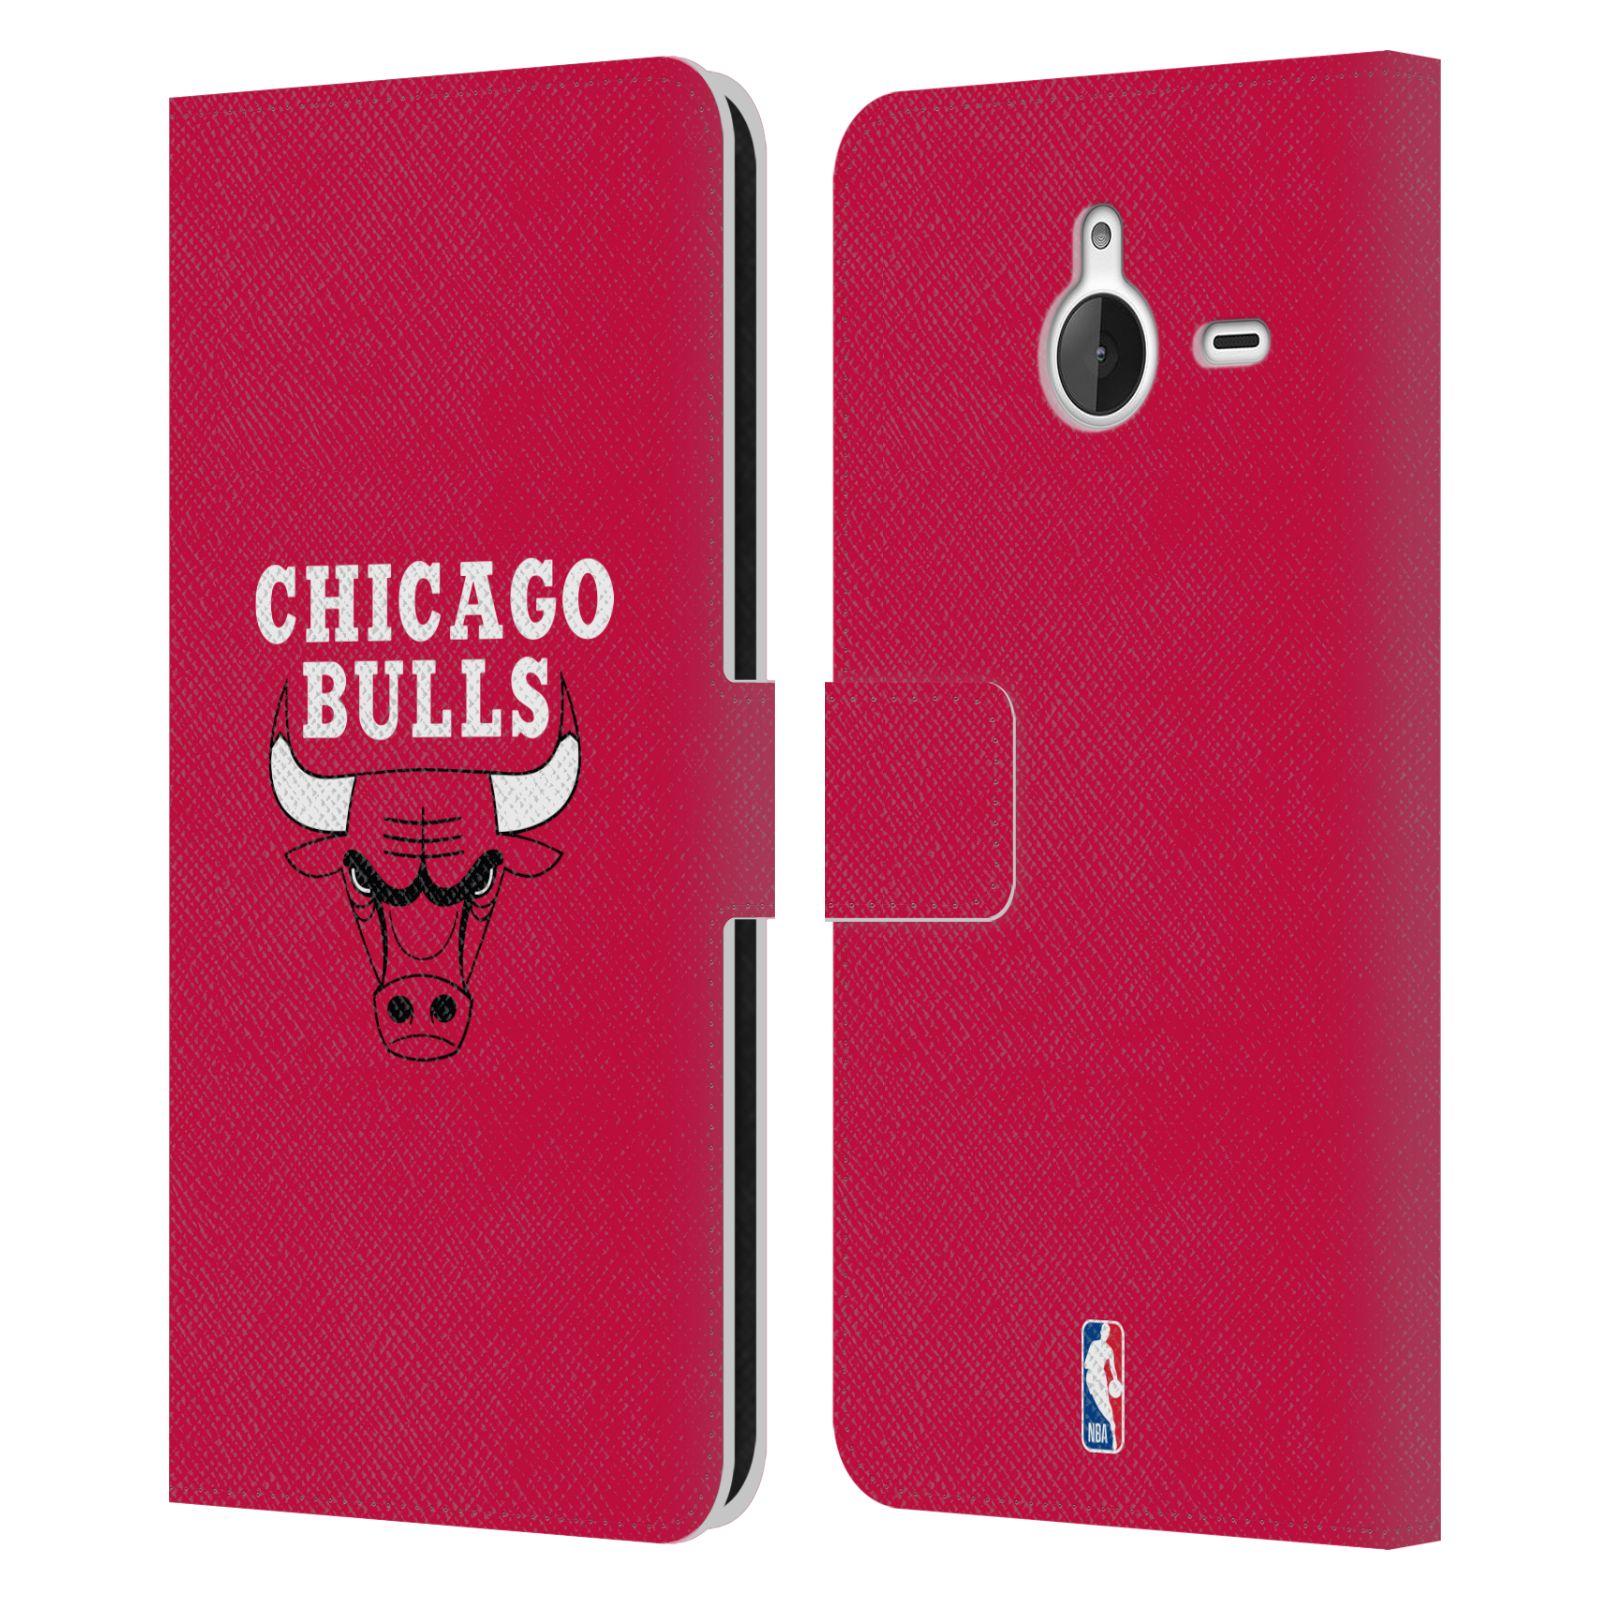 Pouzdro na mobil Nokia Lumia 640 XL - Head Case -NBA - Chicago Bulls červená barva znak